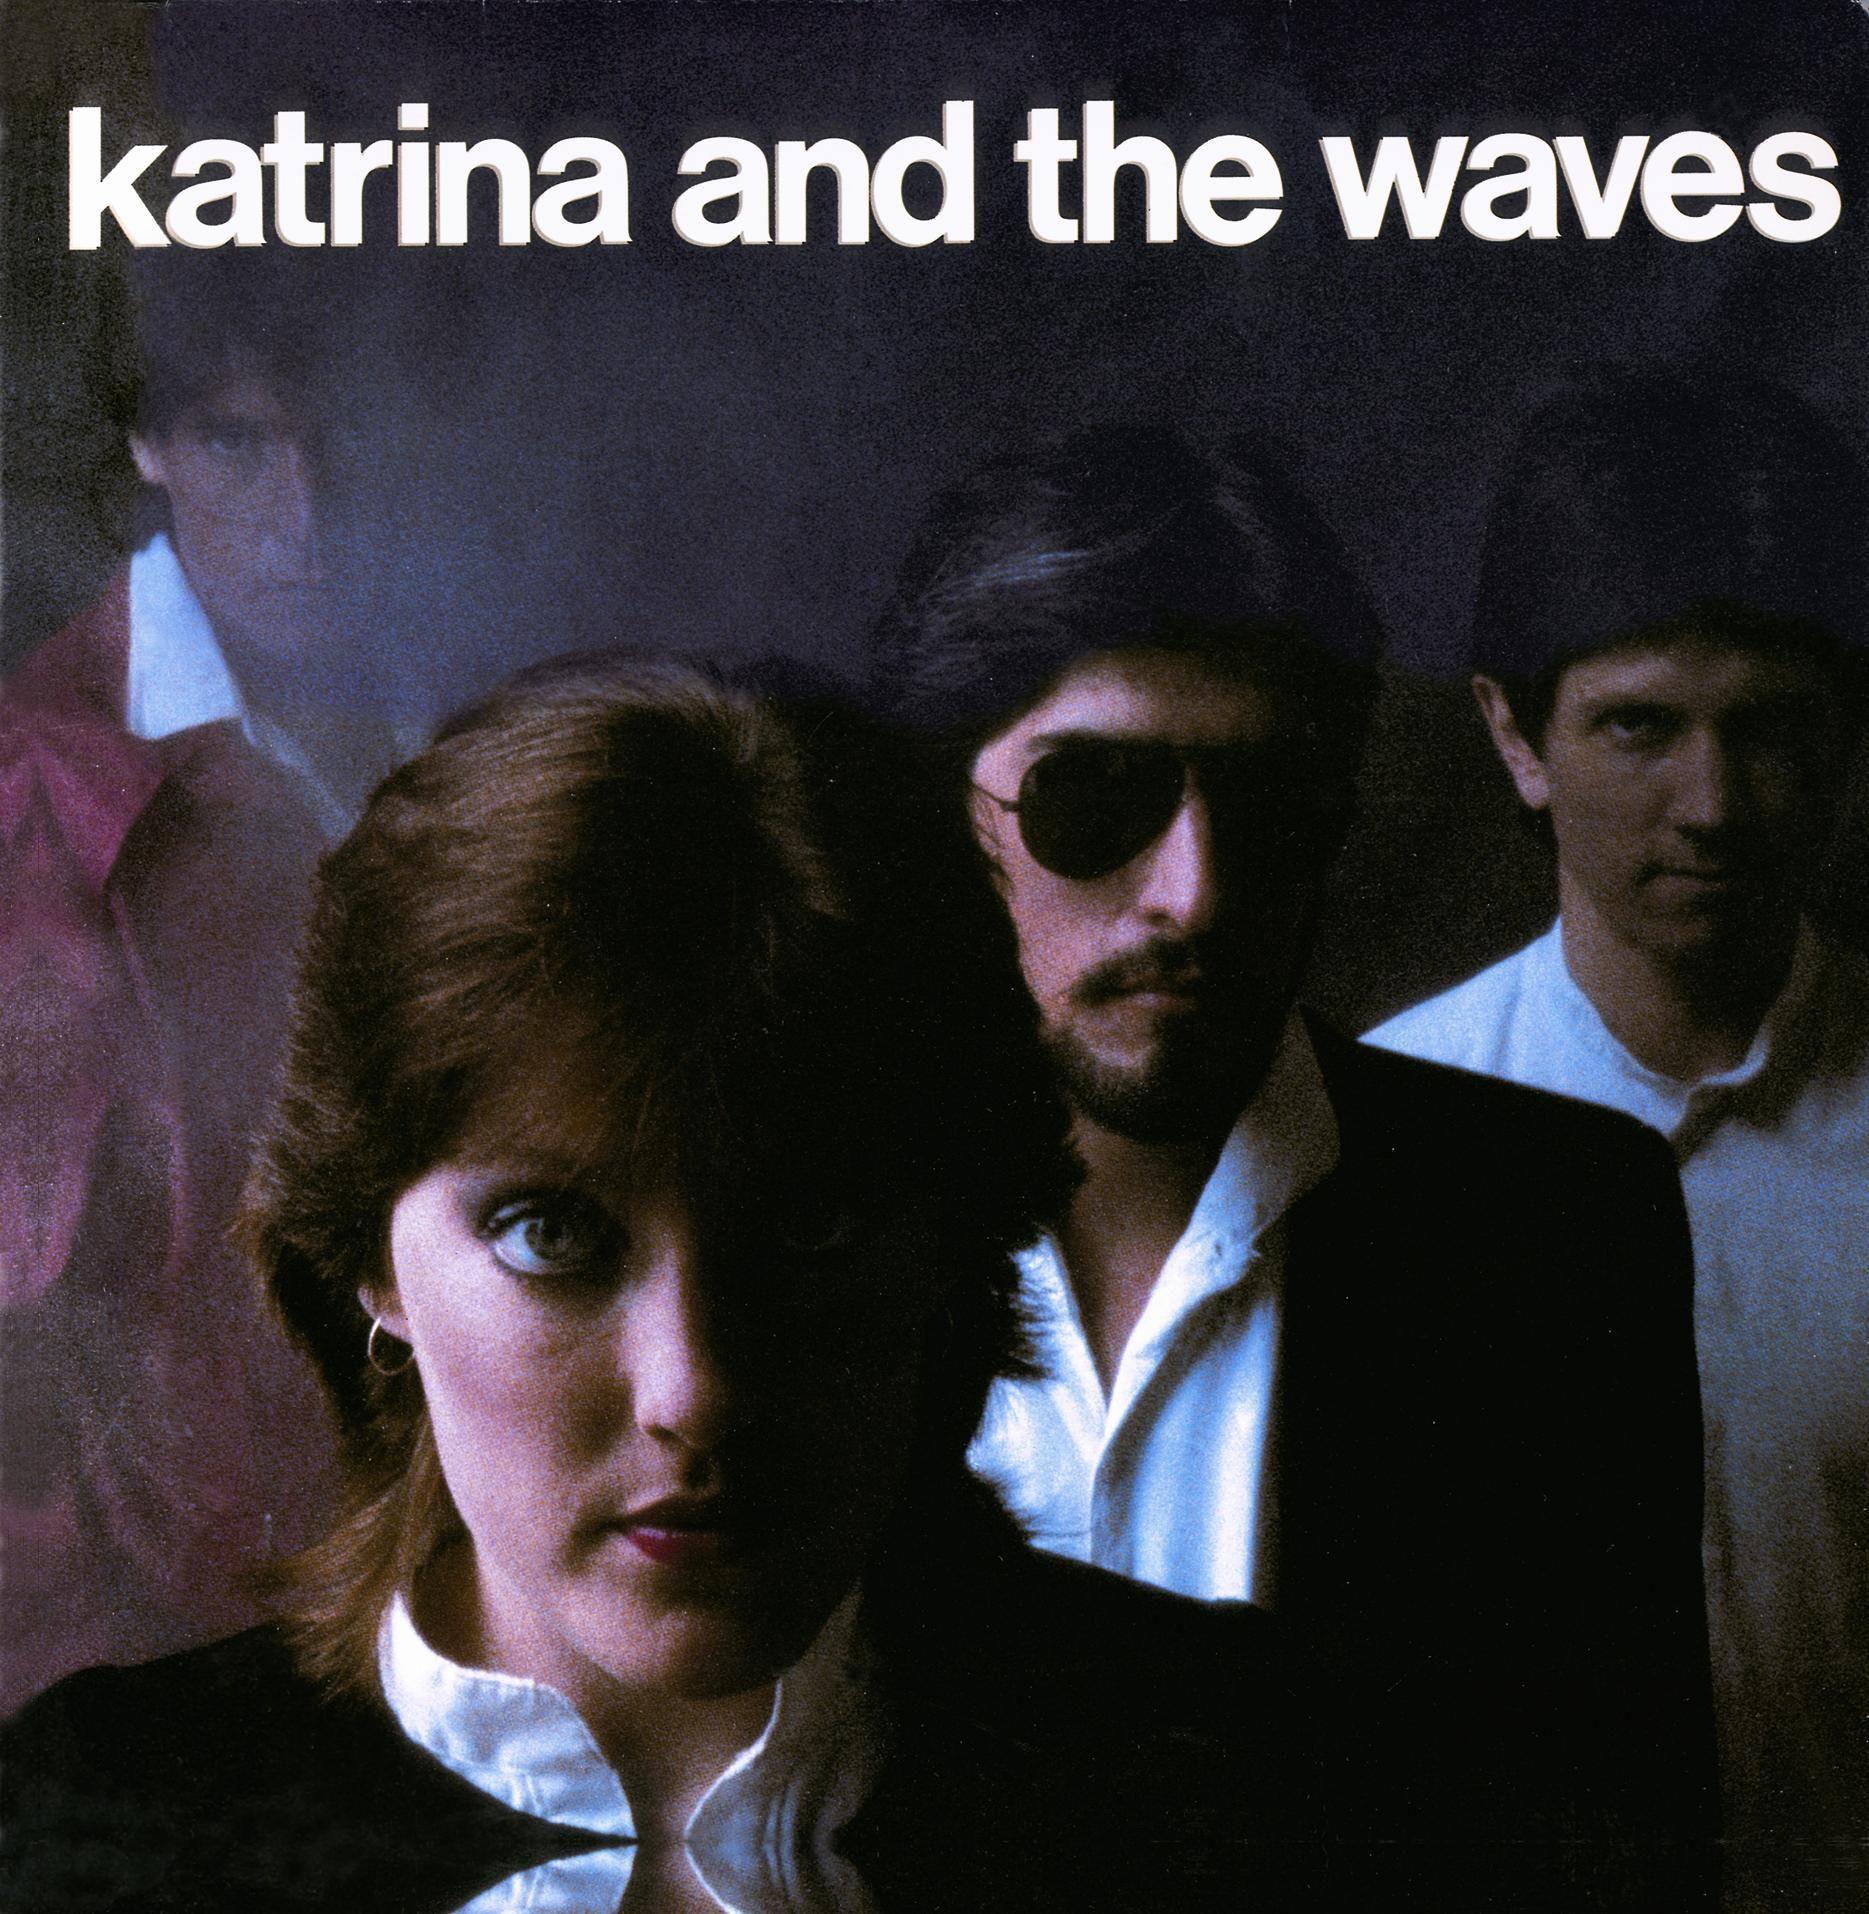 katrina and the waves eurovision win